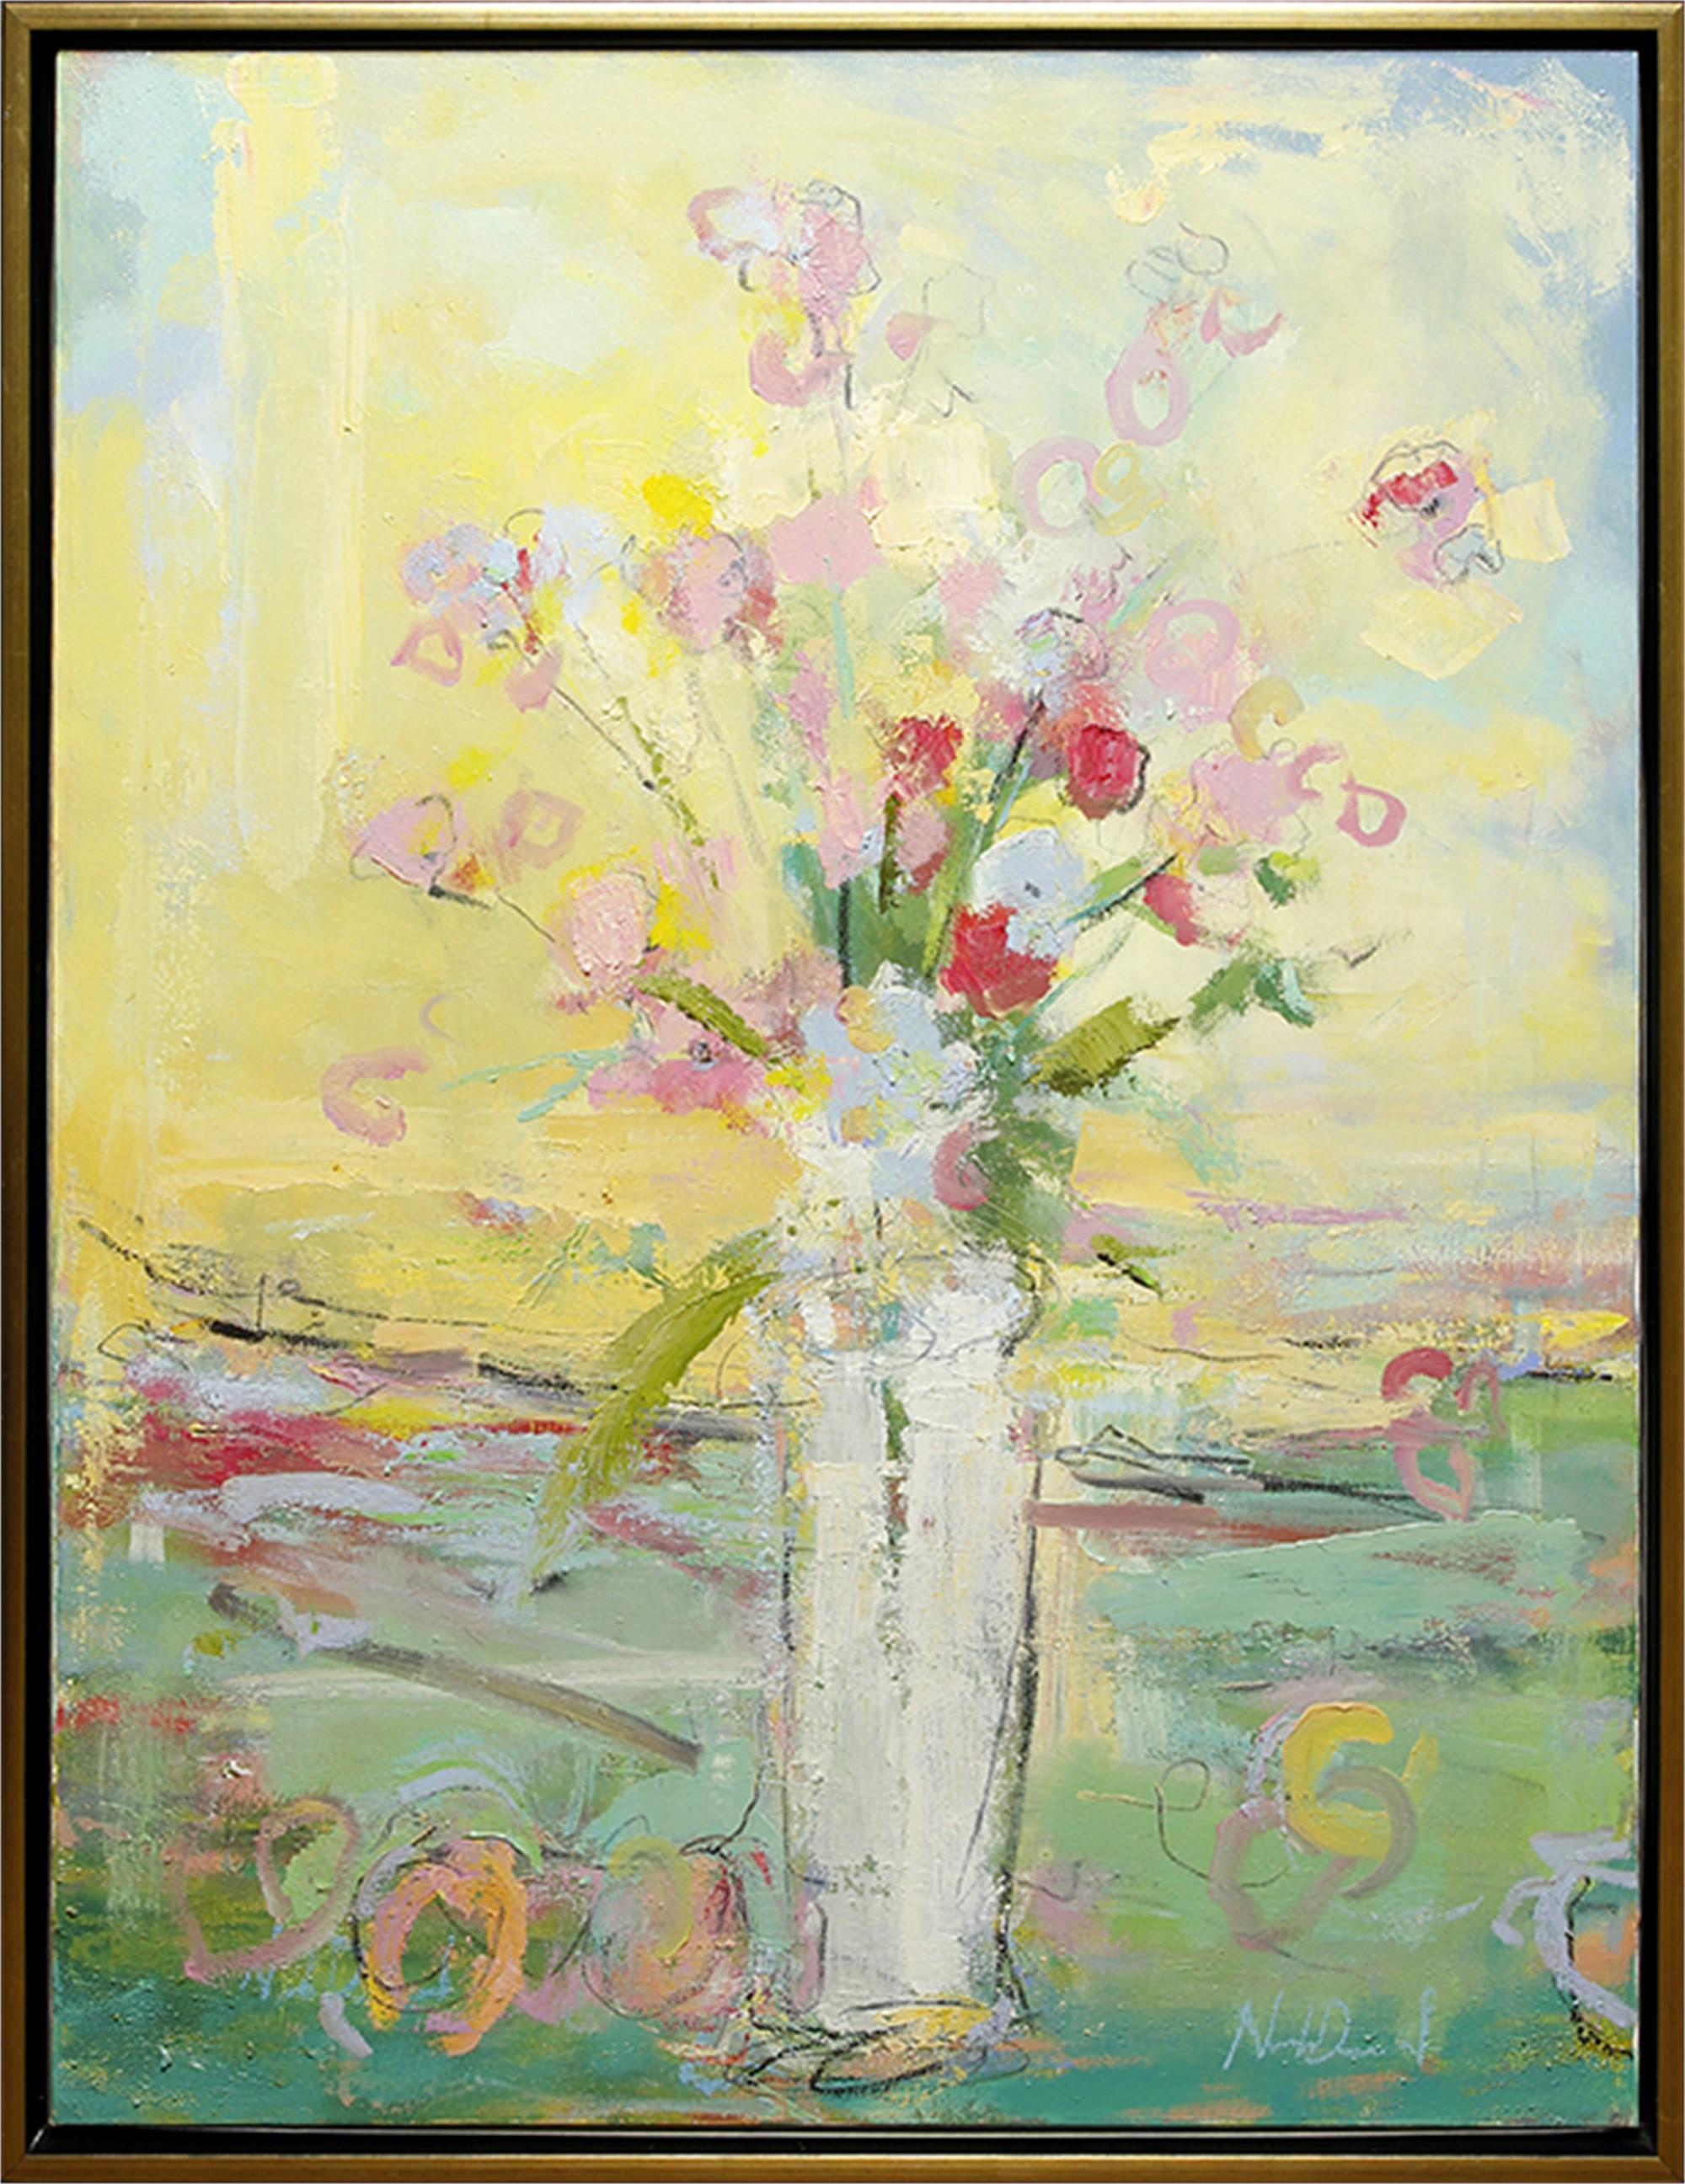 Spring Flowers by Noah Desmond